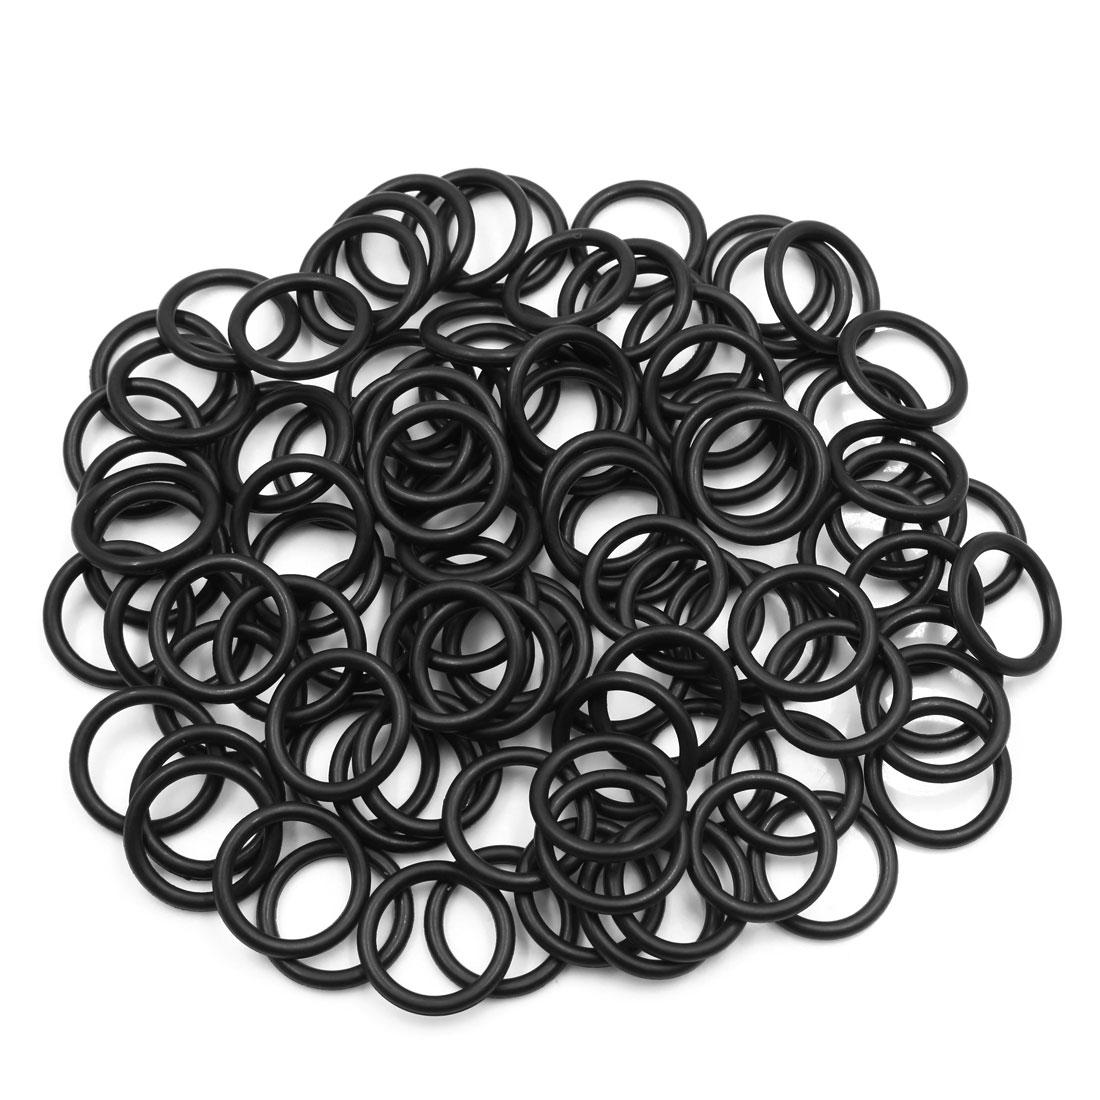 100pcs Black Universal Nitrile Rubber O-Ring Seals Gasket for Car 21.2 x 3.55mm